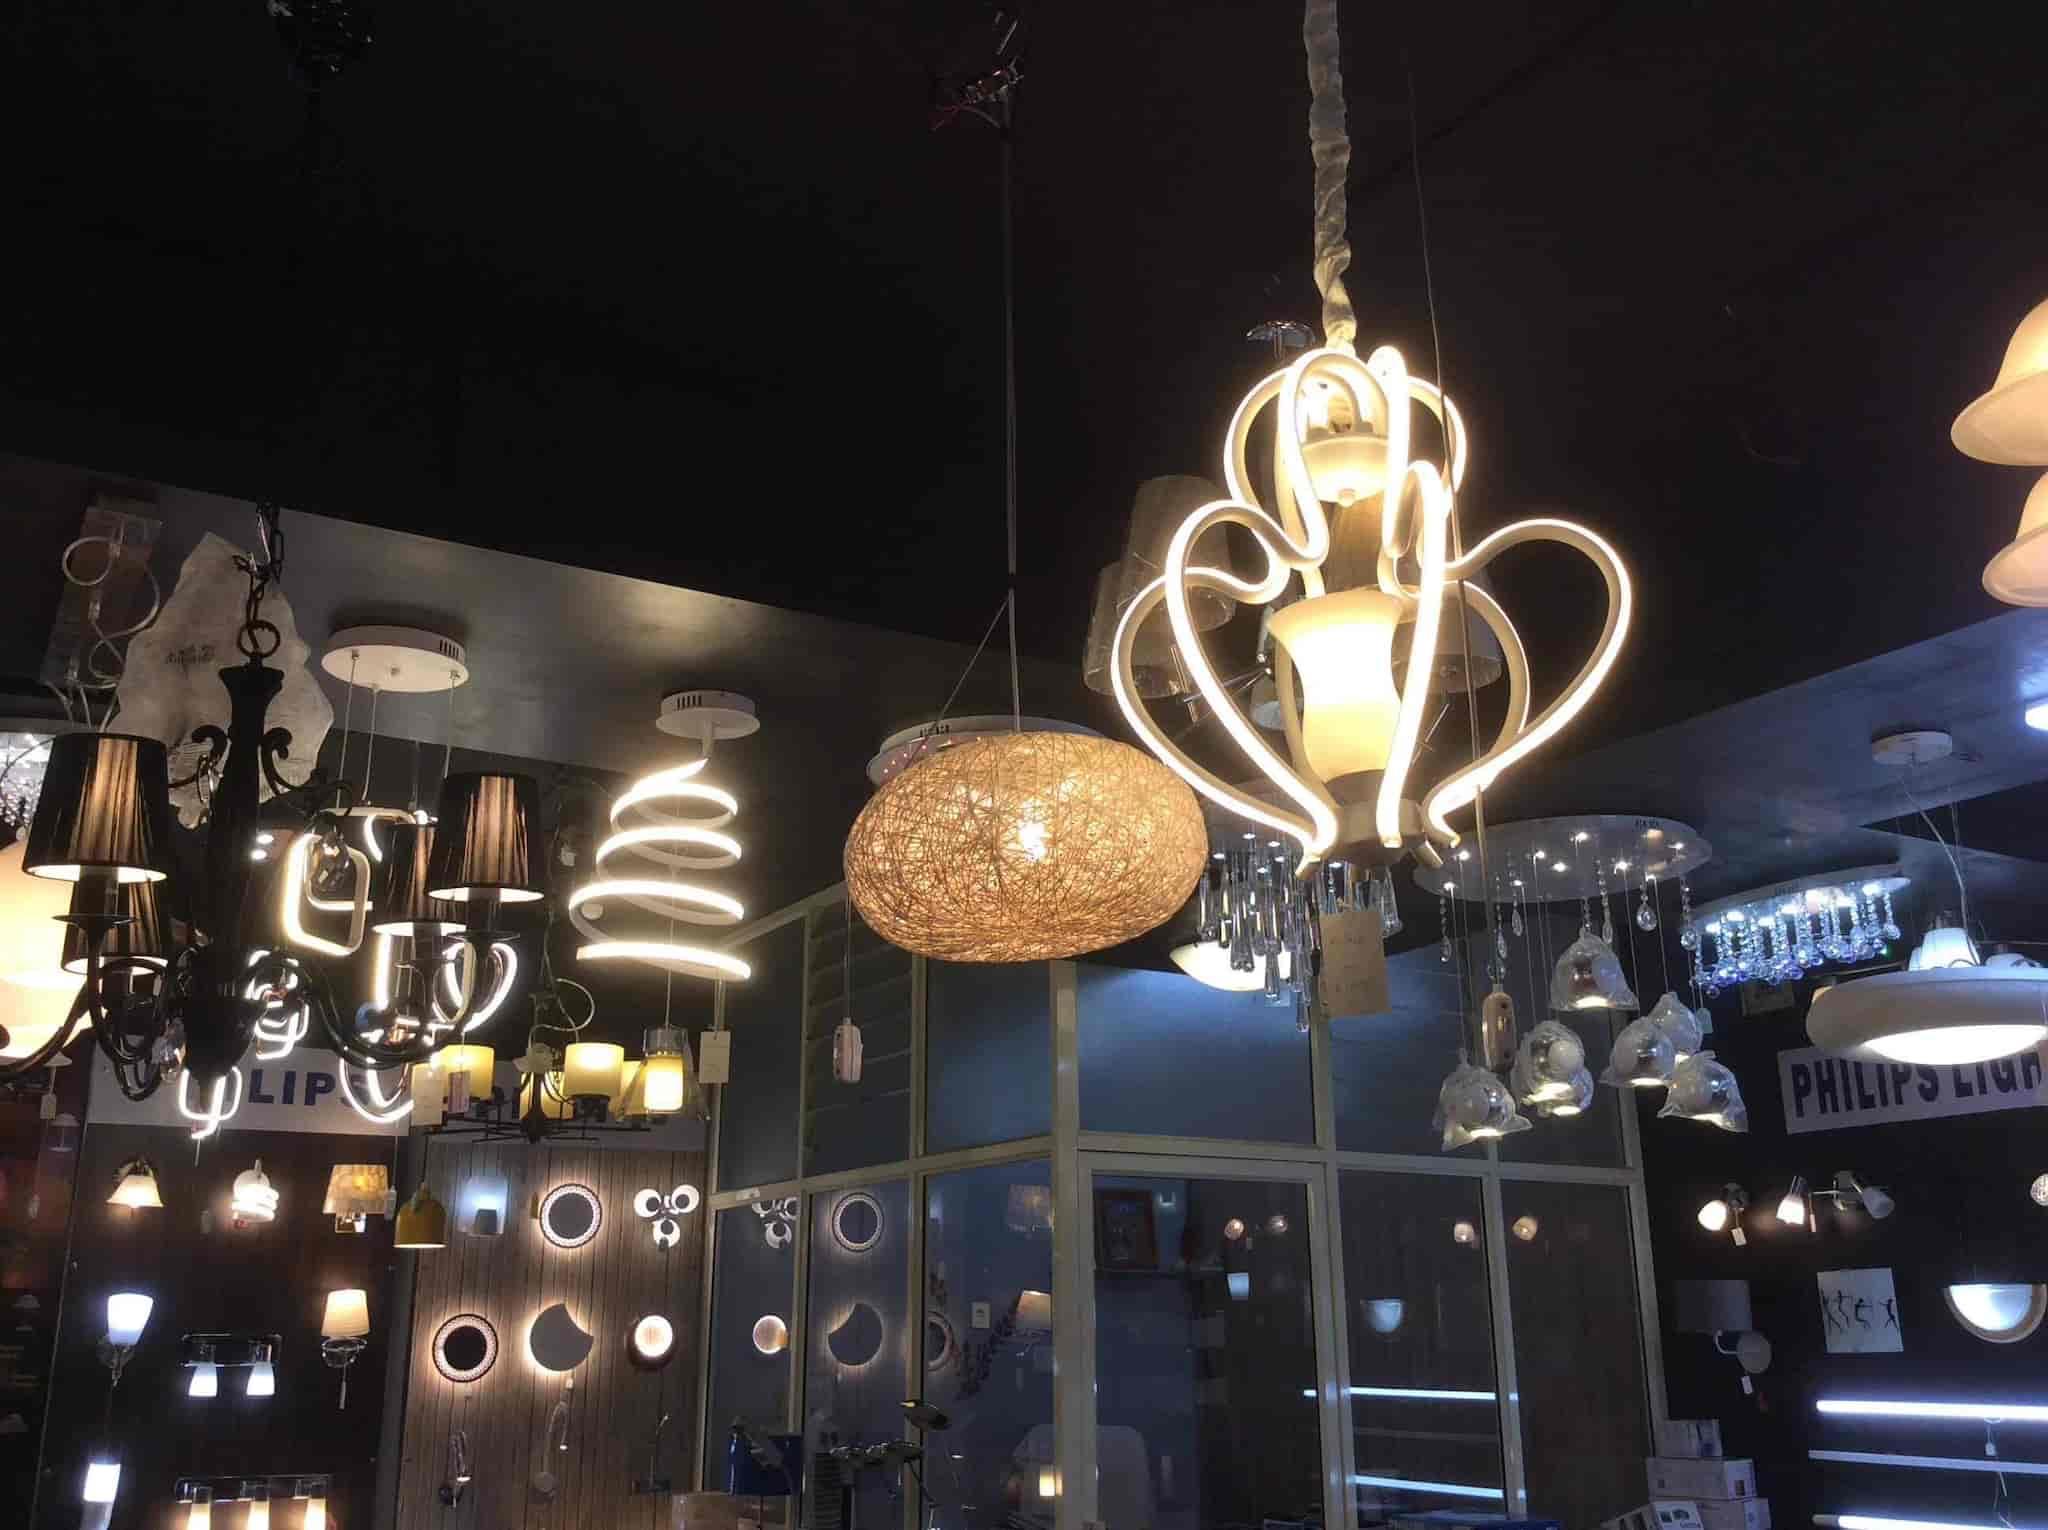 Chirag light n living philips light shoppe savalanga road led chirag light n living philips light shoppe savalanga road led light dealers in shimoga justdial arubaitofo Choice Image